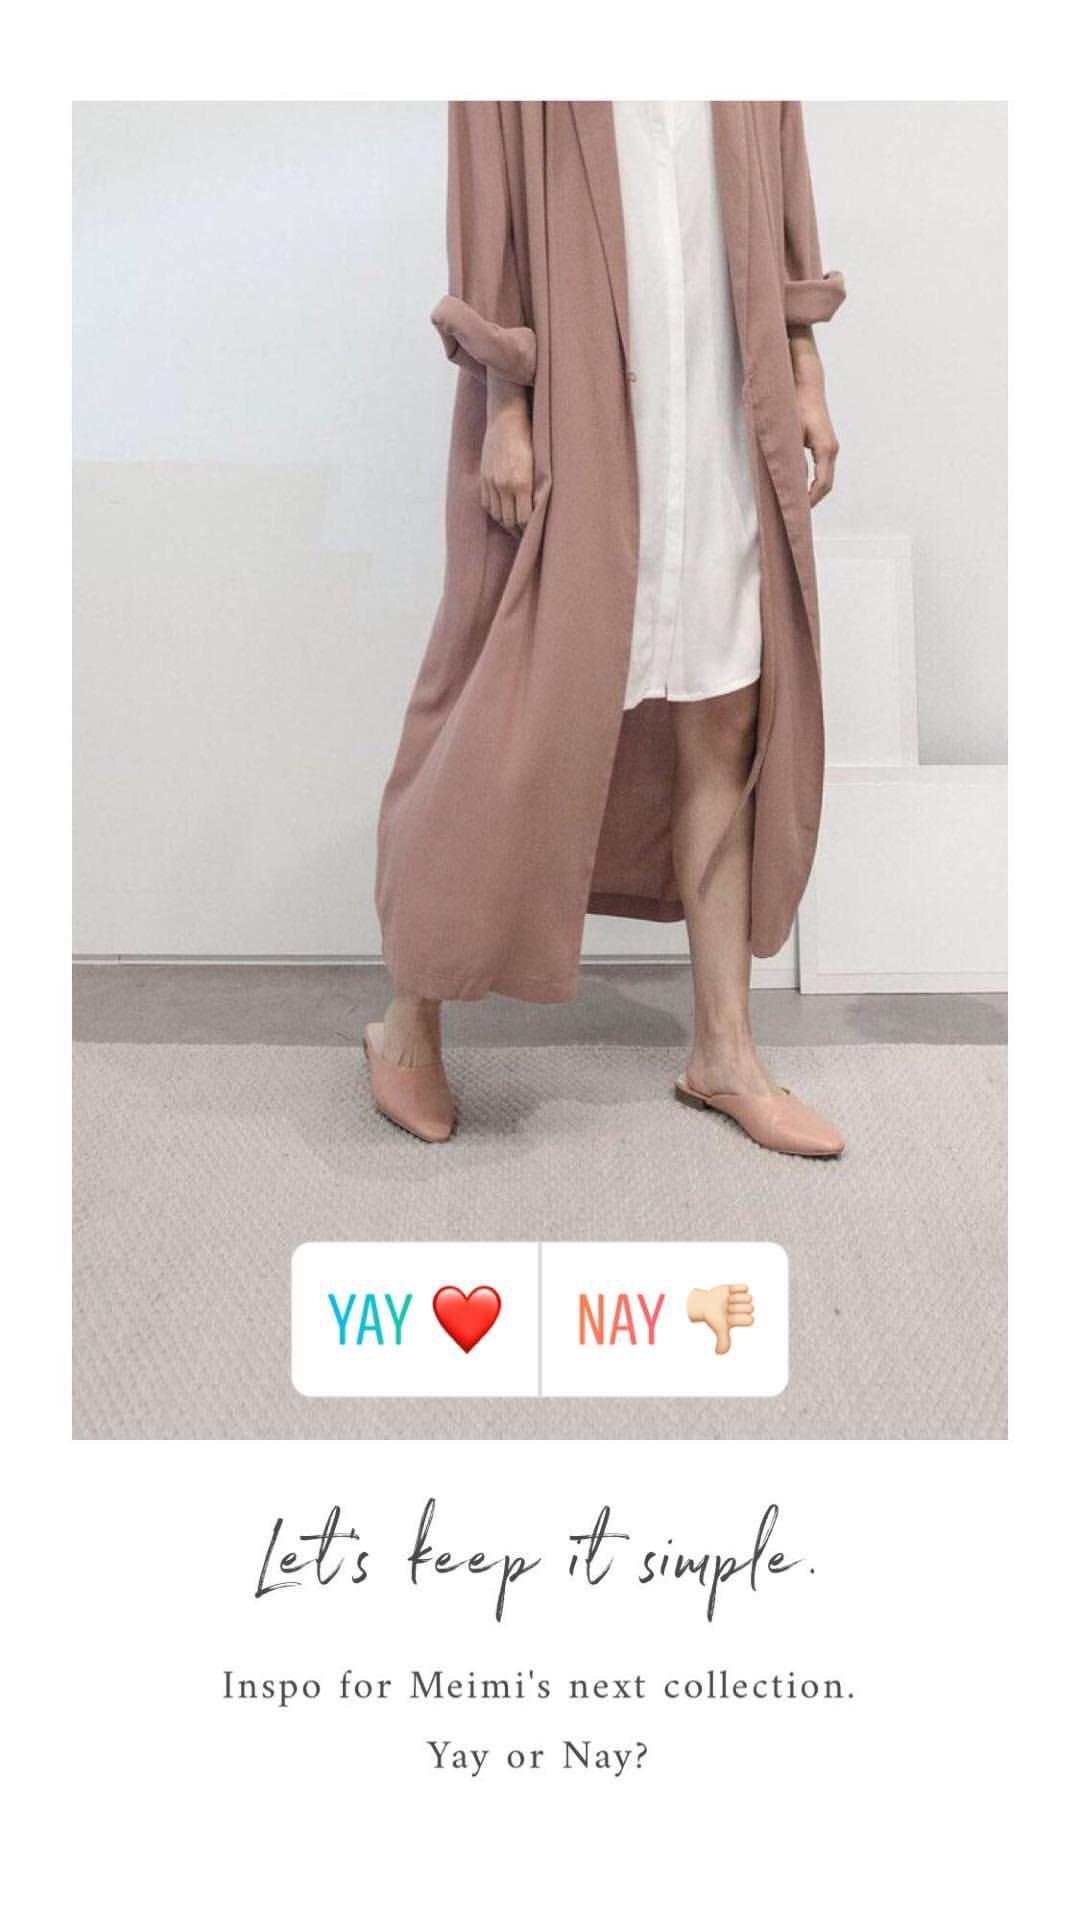 Re-branding Plans for Meimi Clothing